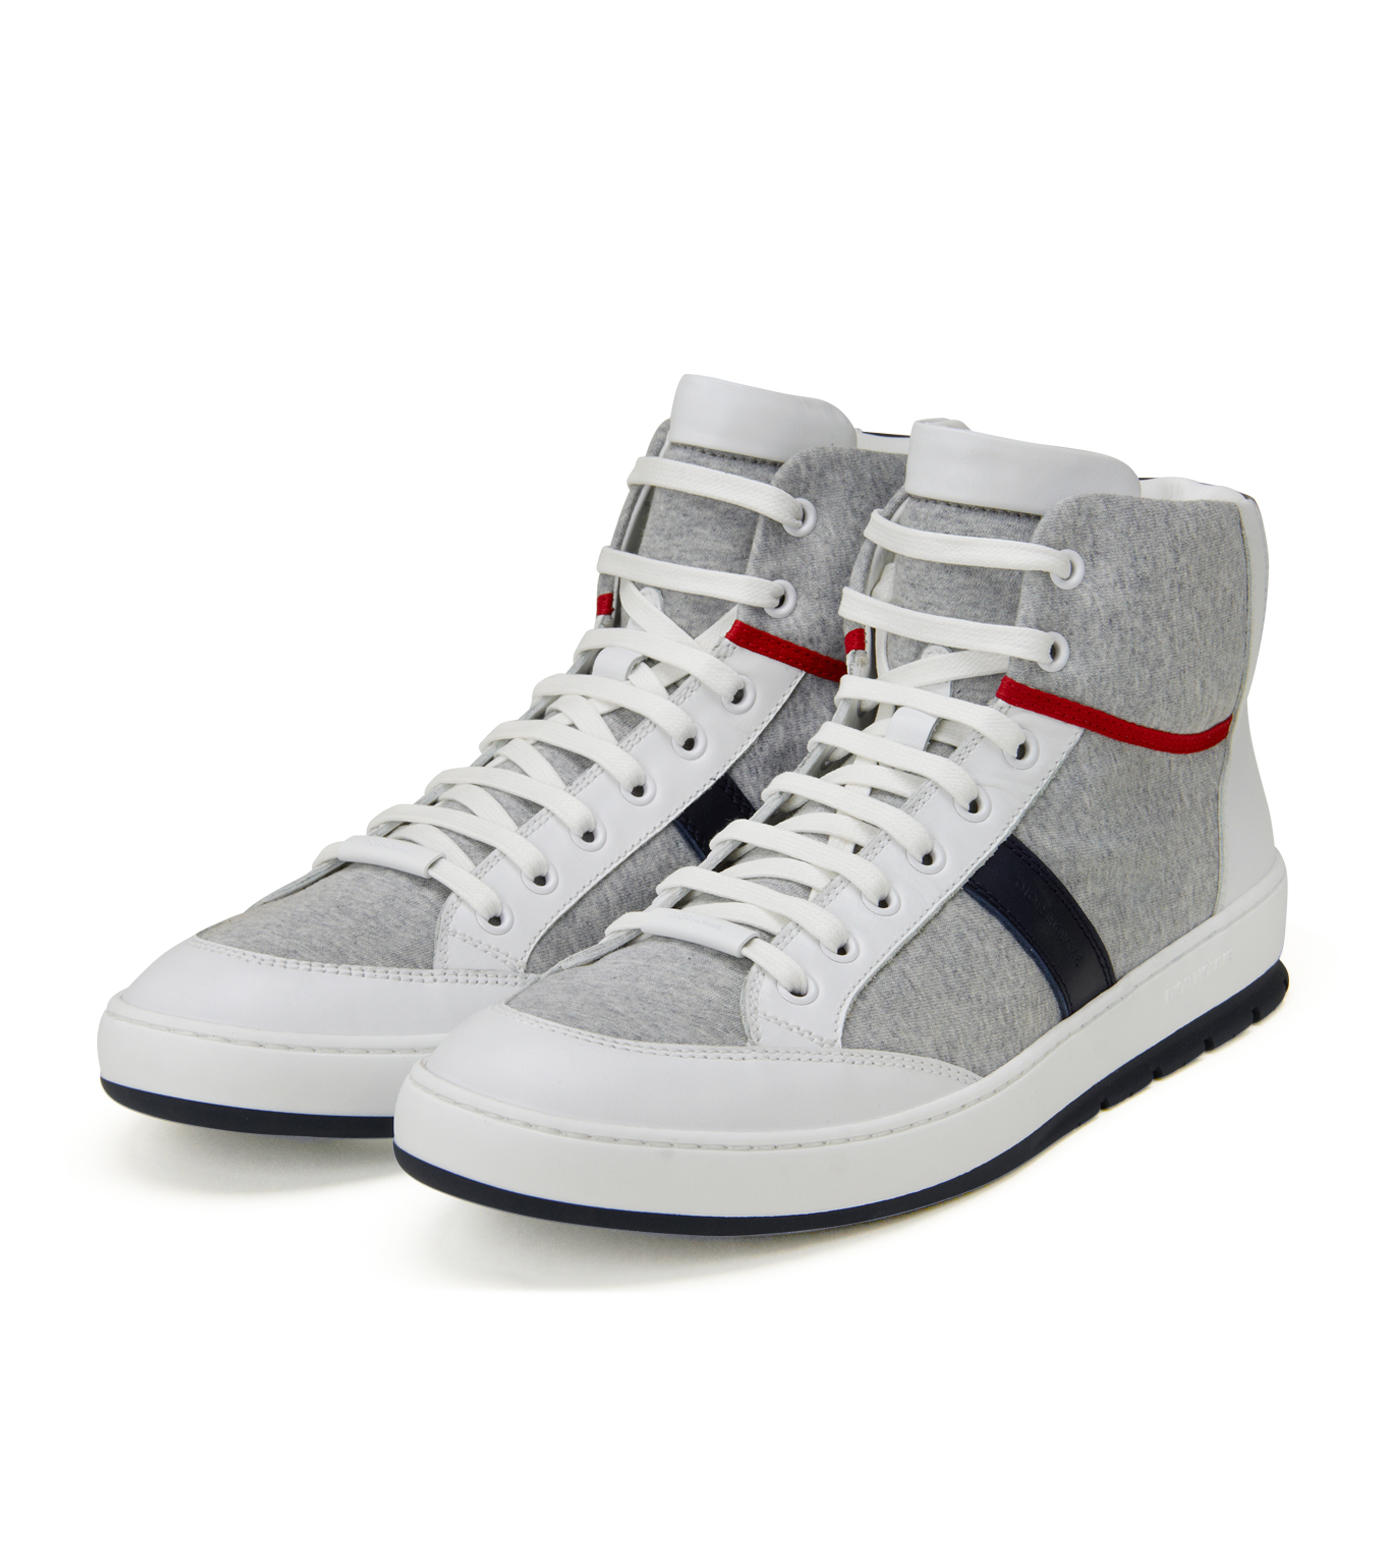 Dior Homme(ディオール オム)のSweat High Sneaker-WHITE-3SH007 拡大詳細画像4